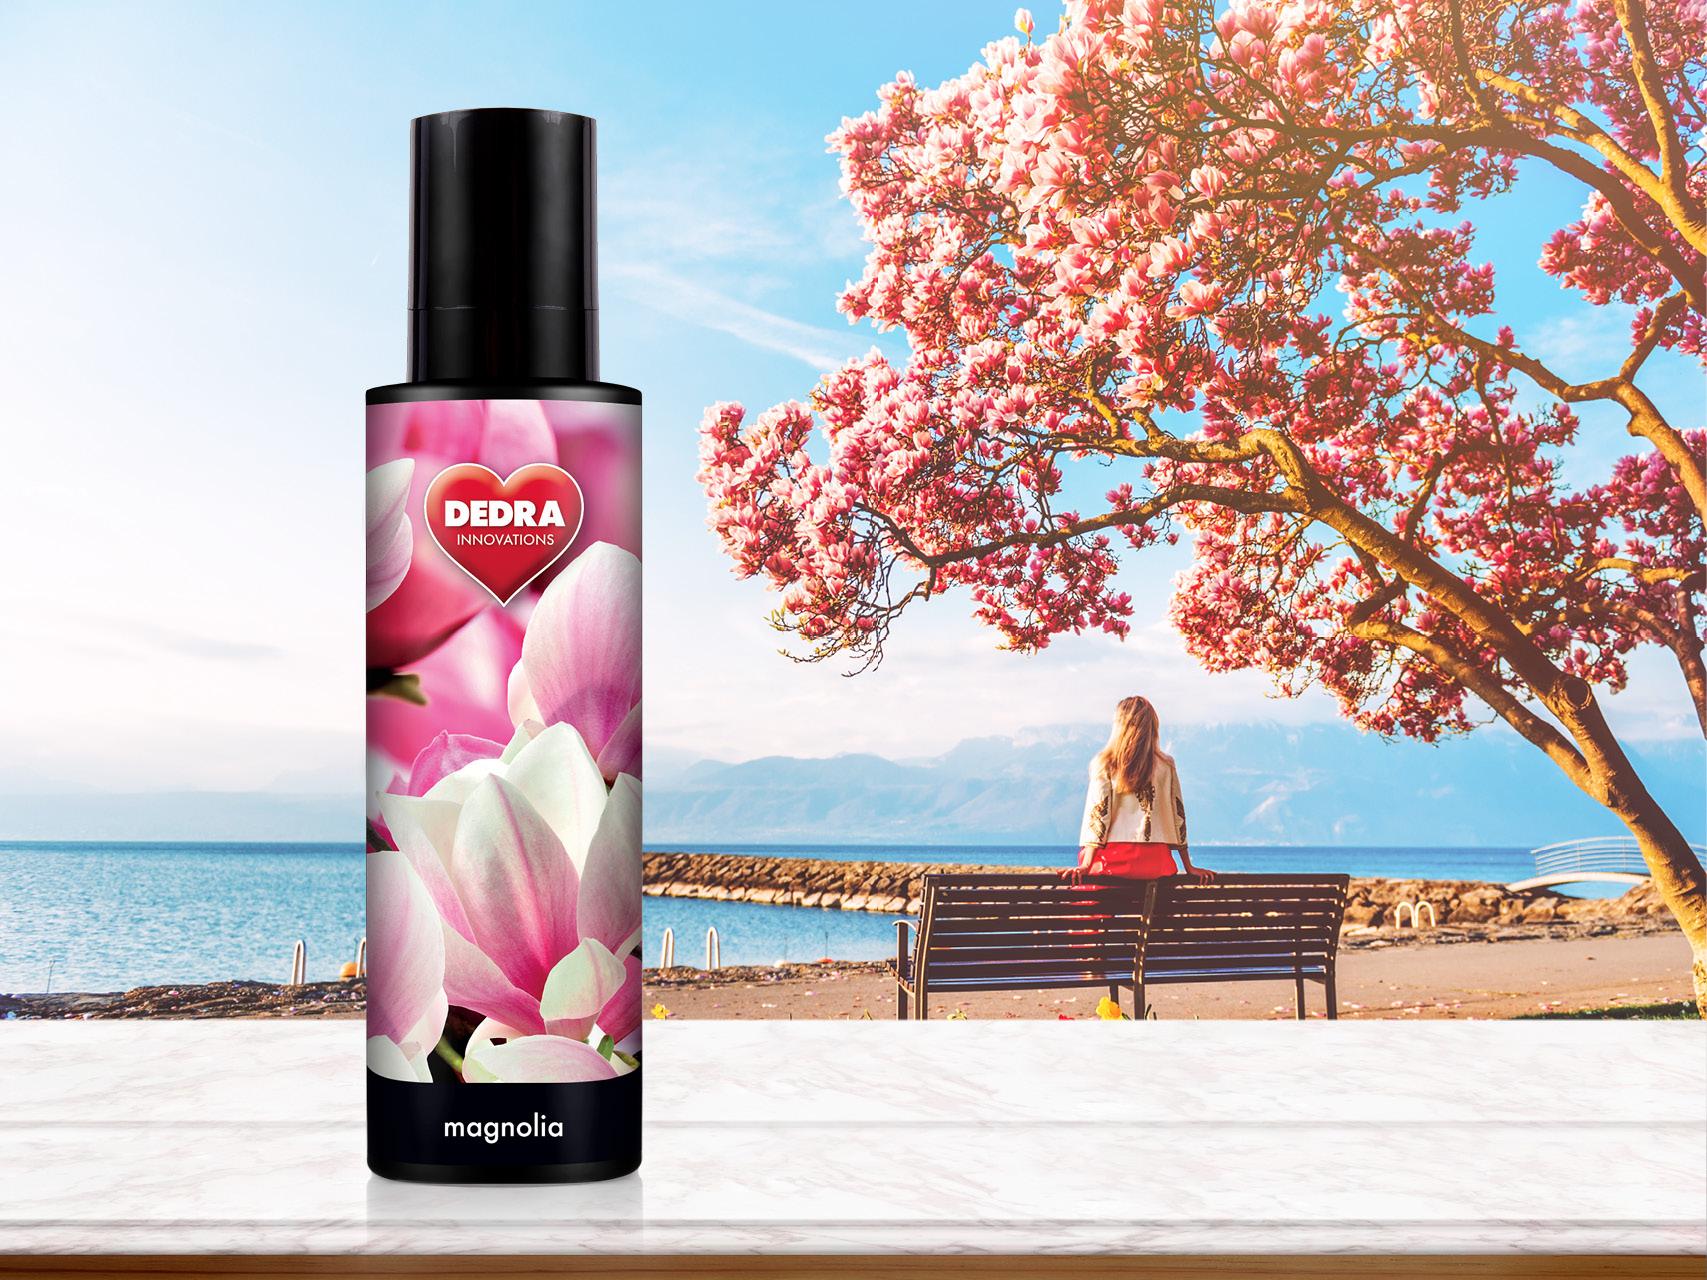 PARFUM air&textiles, magnolia, osvěžovač vzduchu a textilií